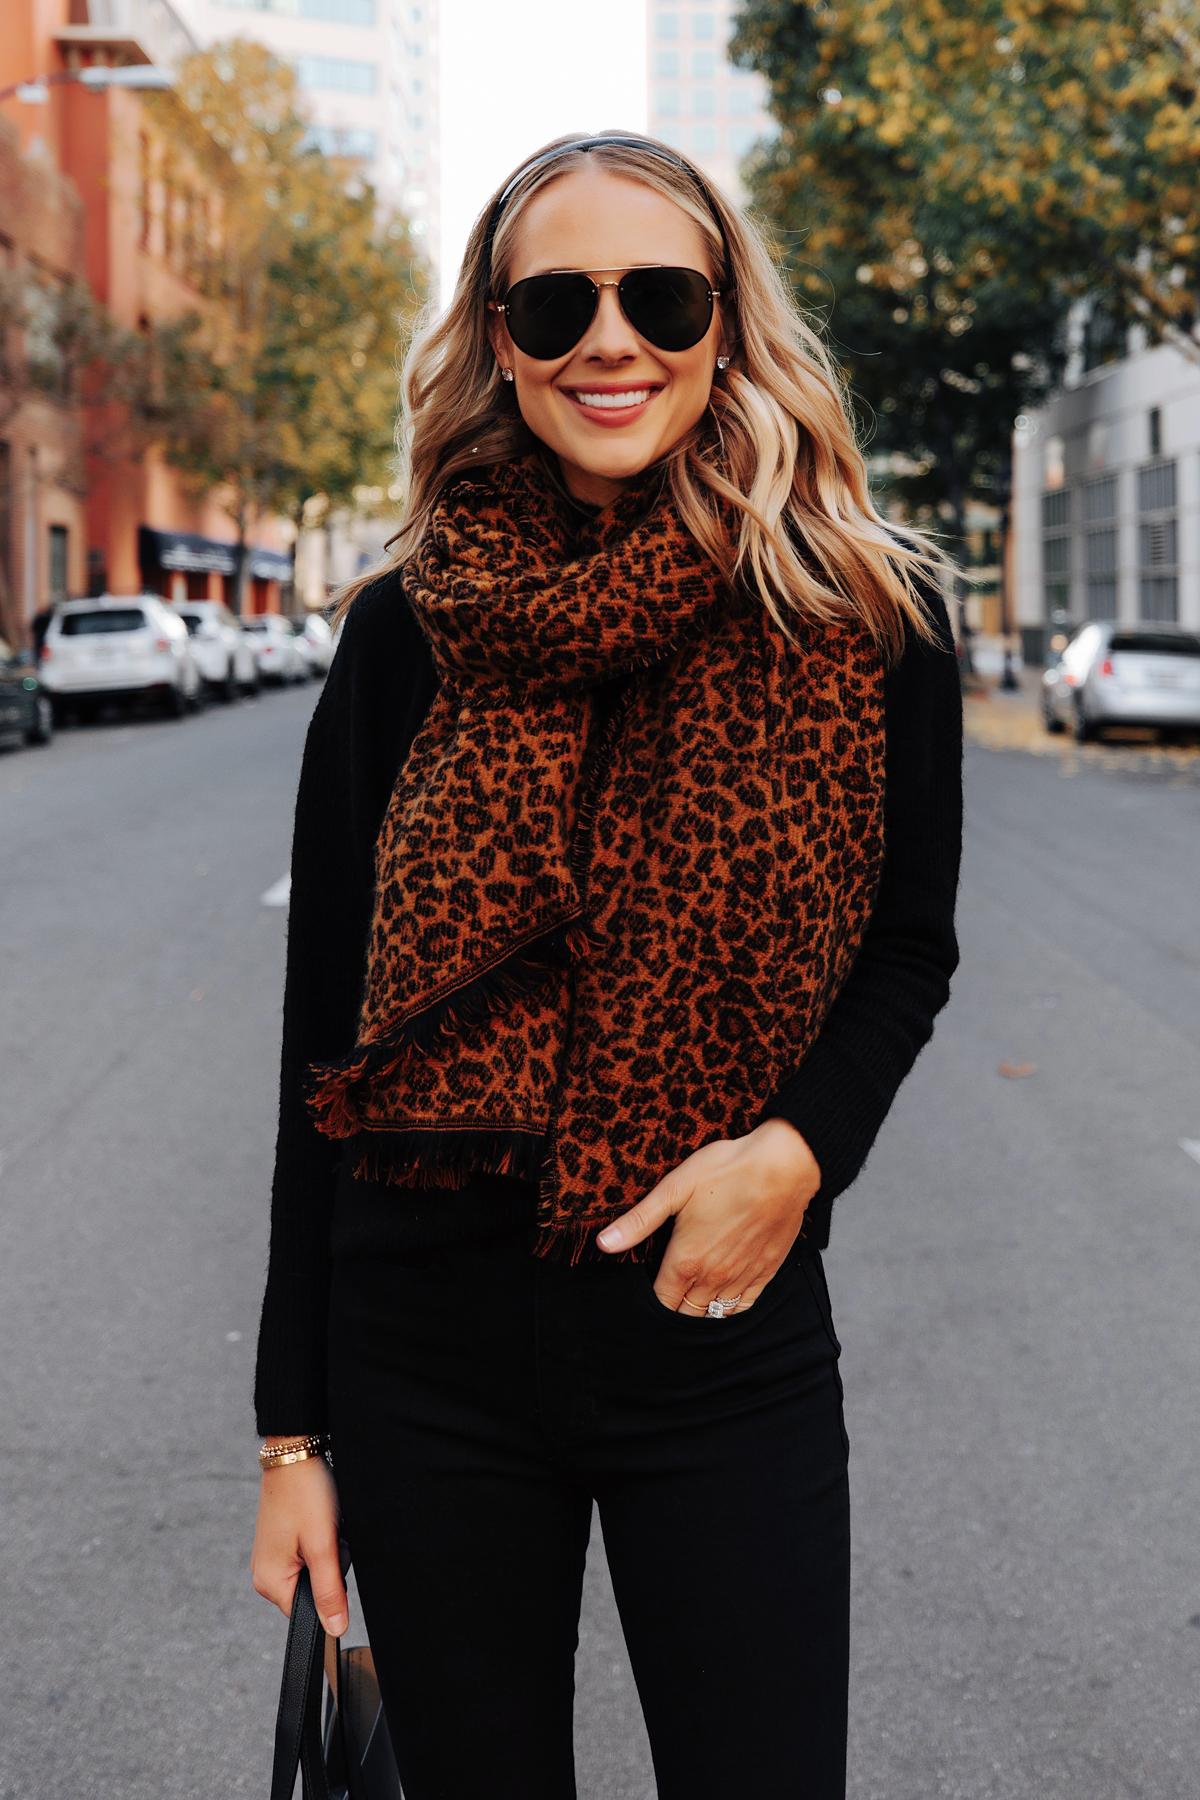 Fashion Jackson Wearing Leopard Blanket Scarf Black Headband Black Sweater